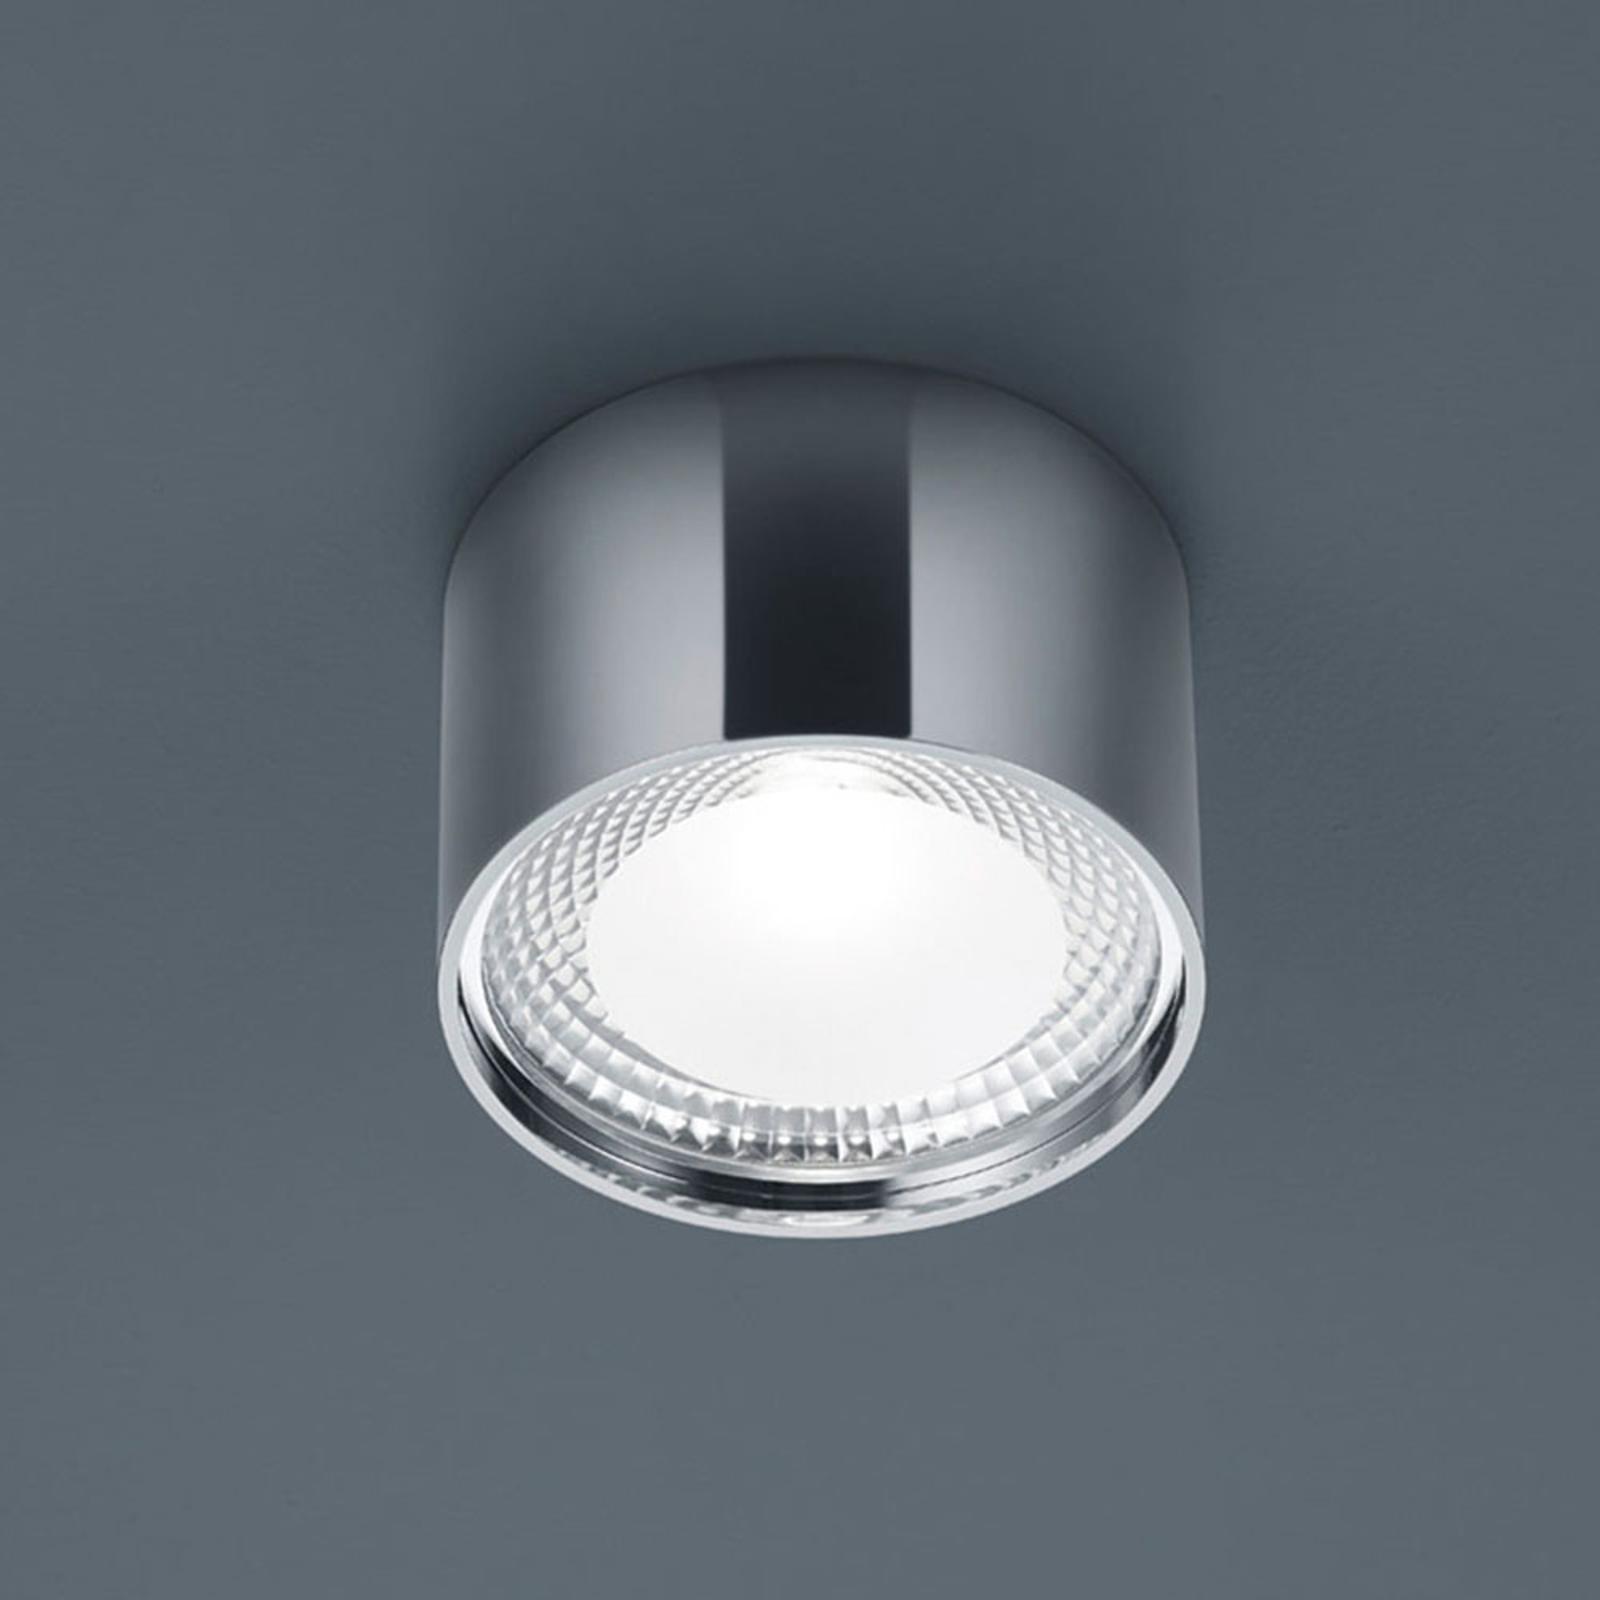 Helestra Kari LED plafondlamp, rond, chroom